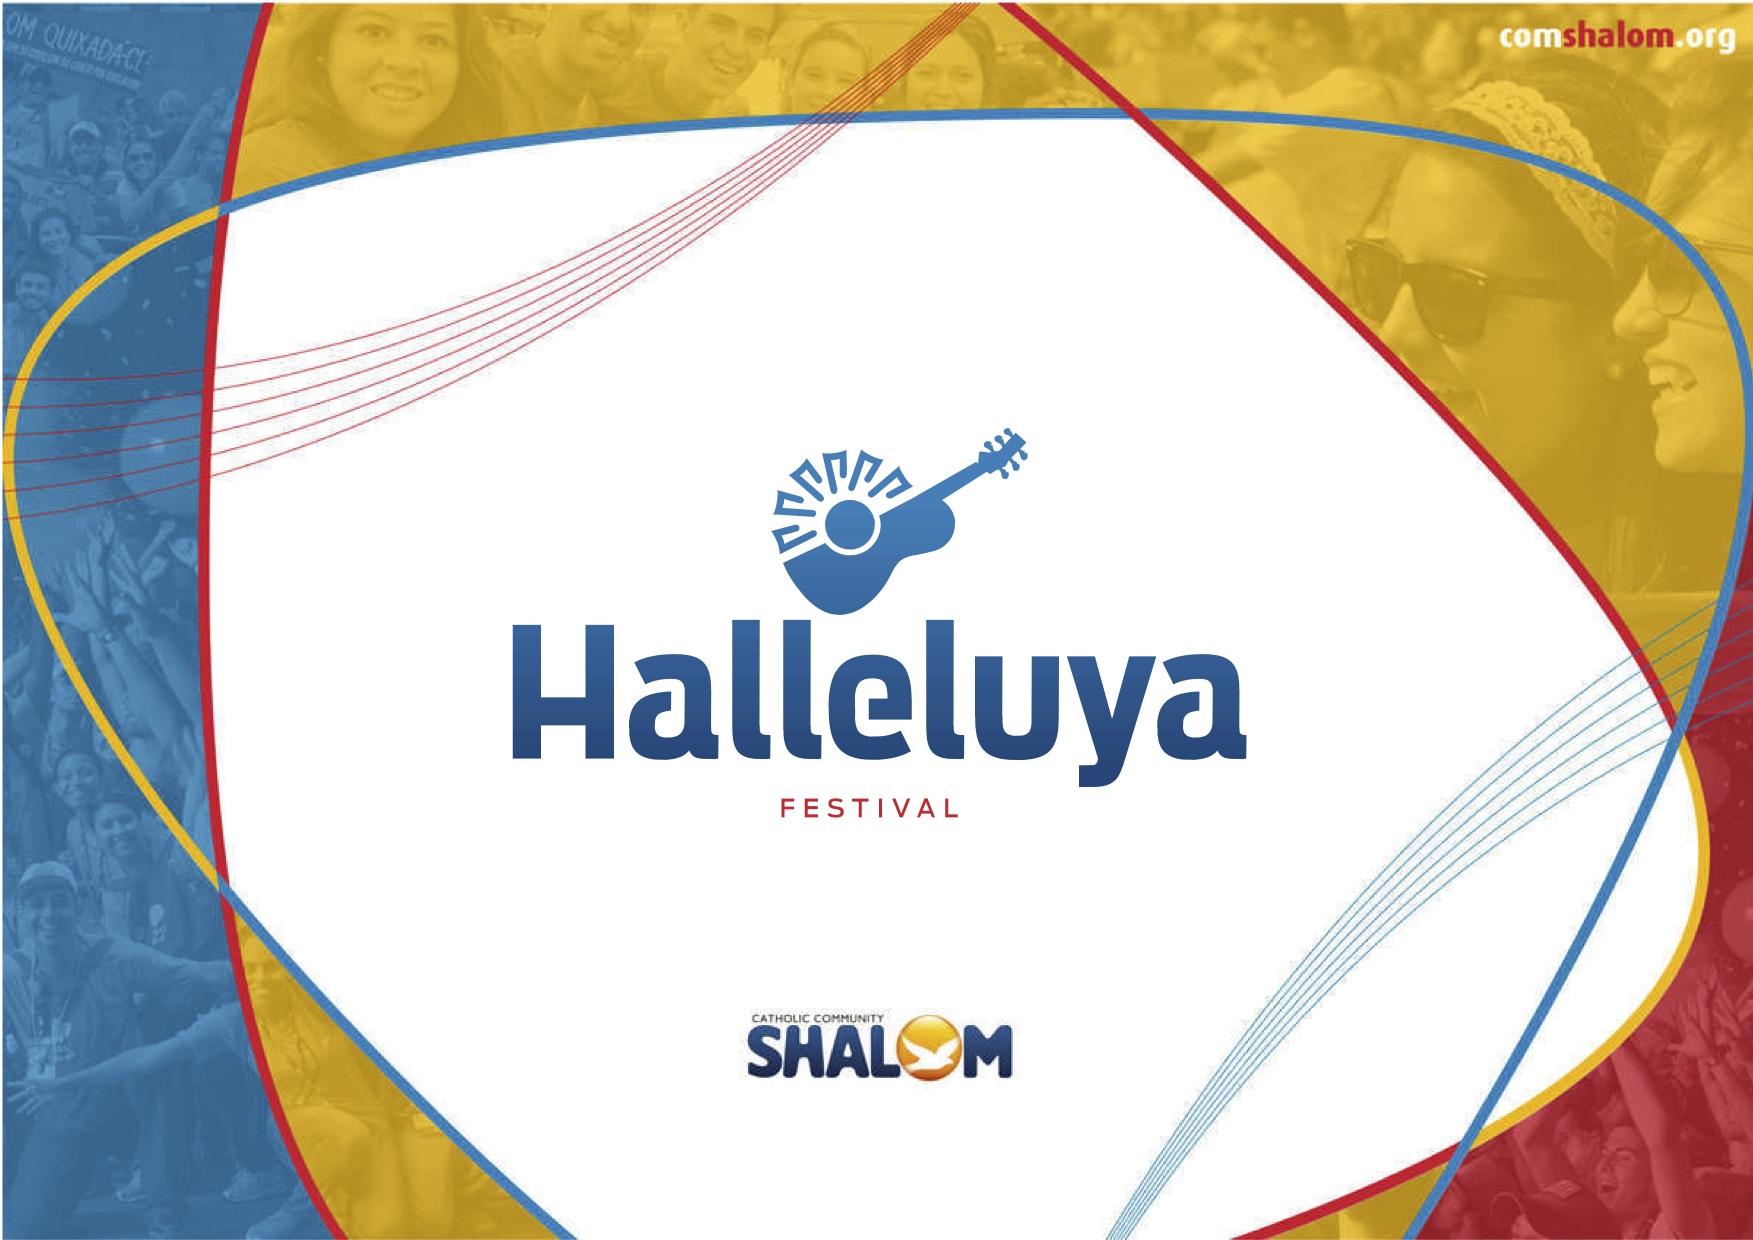 Halleluja Festival